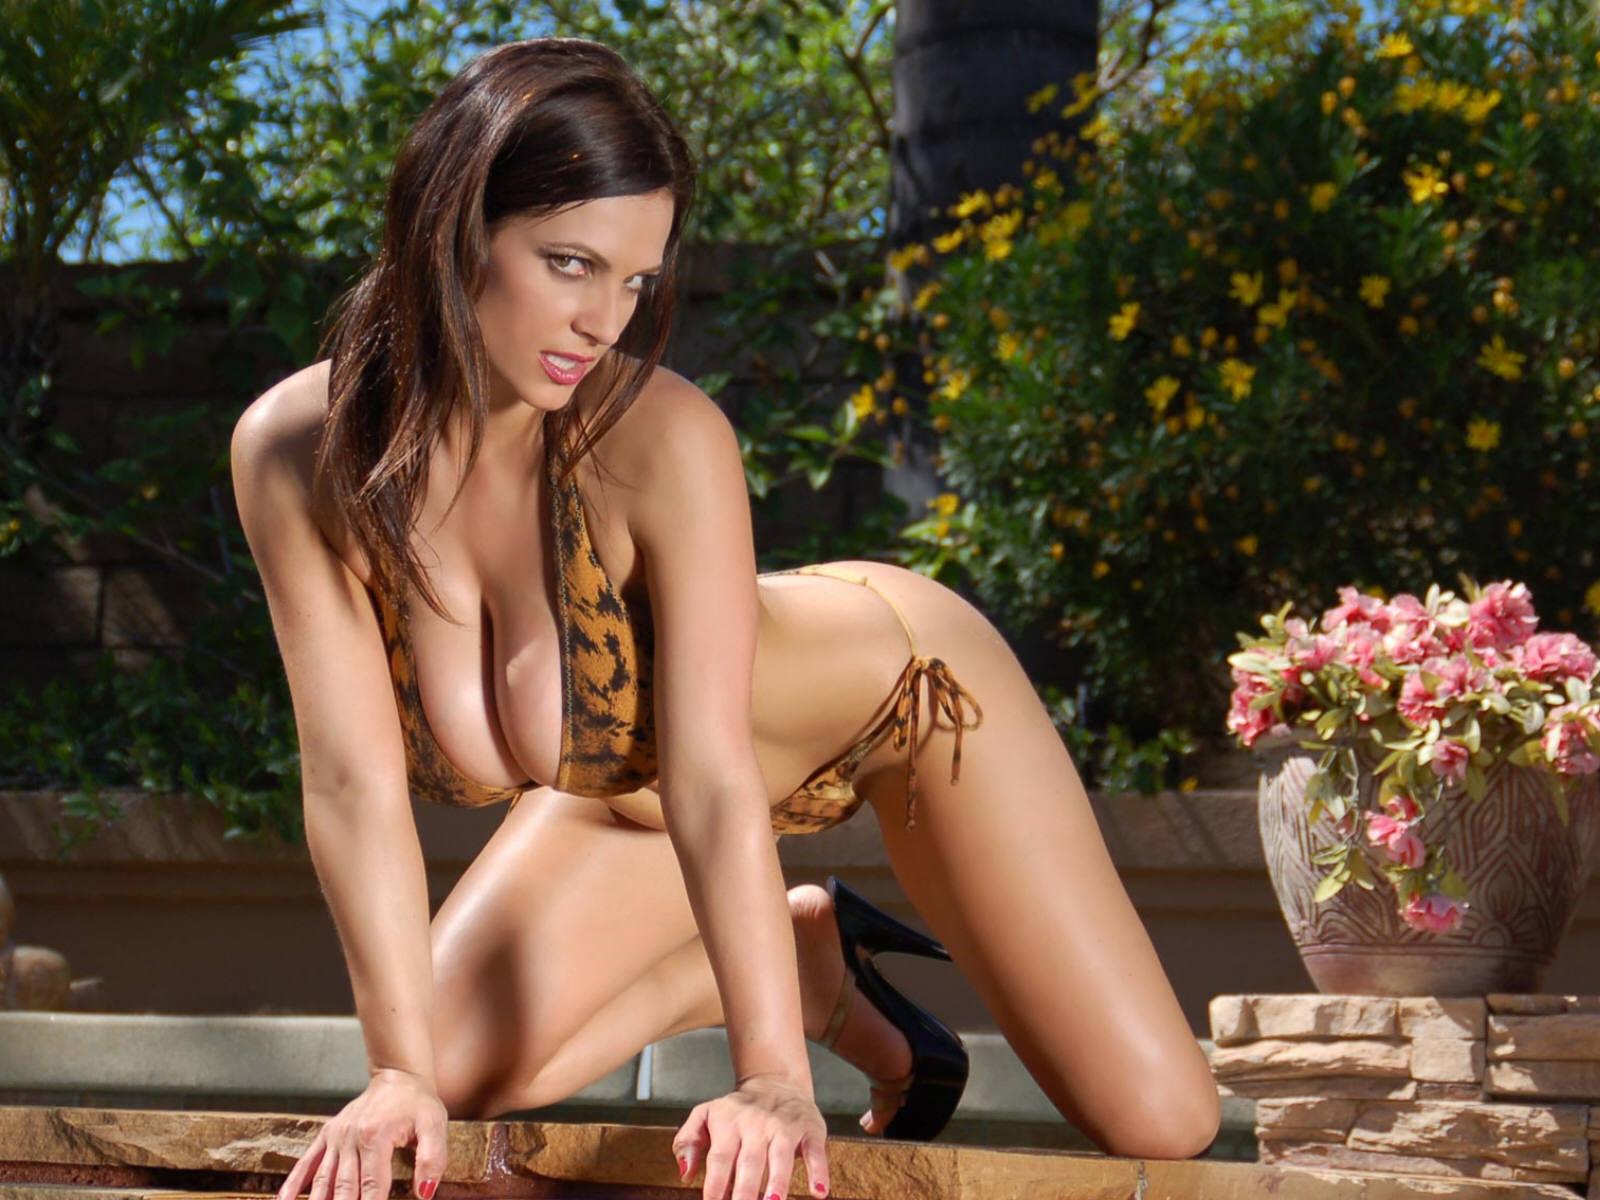 http://2.bp.blogspot.com/_W1ueYt1O3xs/SXT4Rt2VmGI/AAAAAAAAN1o/dLbdiBEZpXc/d/Denise+Milani+%283%29.jpg